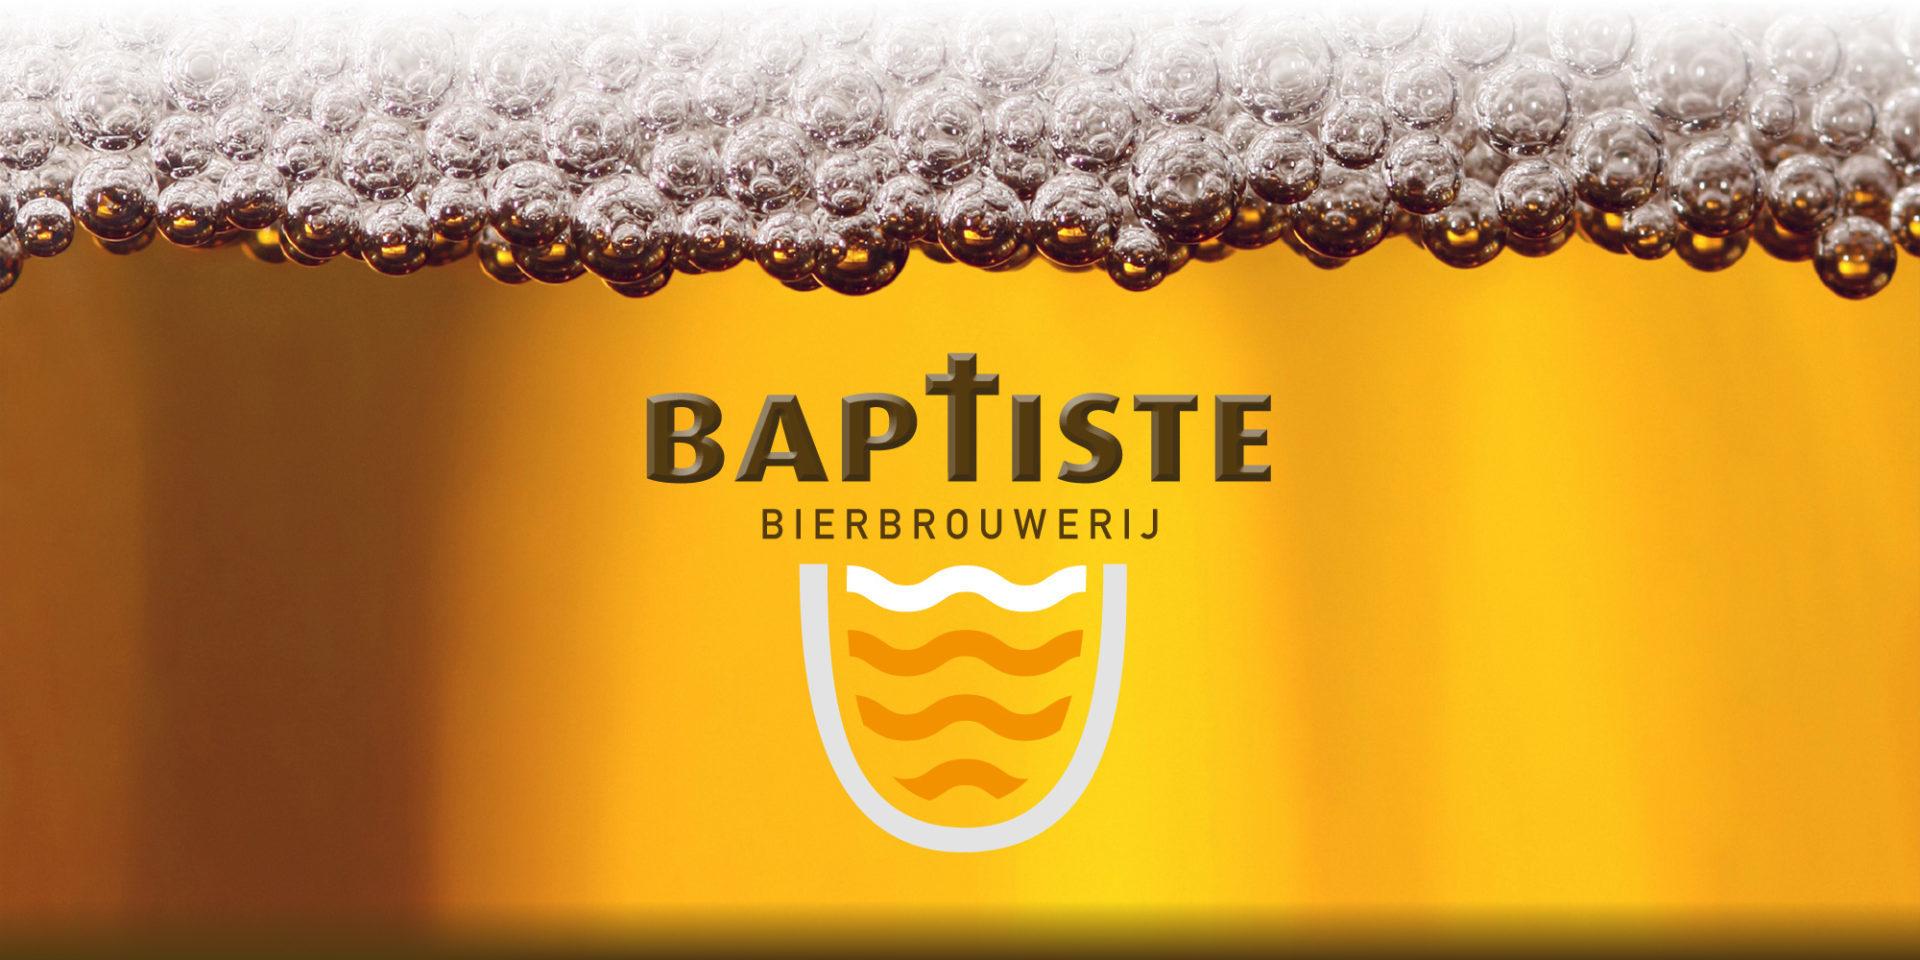 Baptiste-hoofdbanner - Jeroen Borrenbergs)